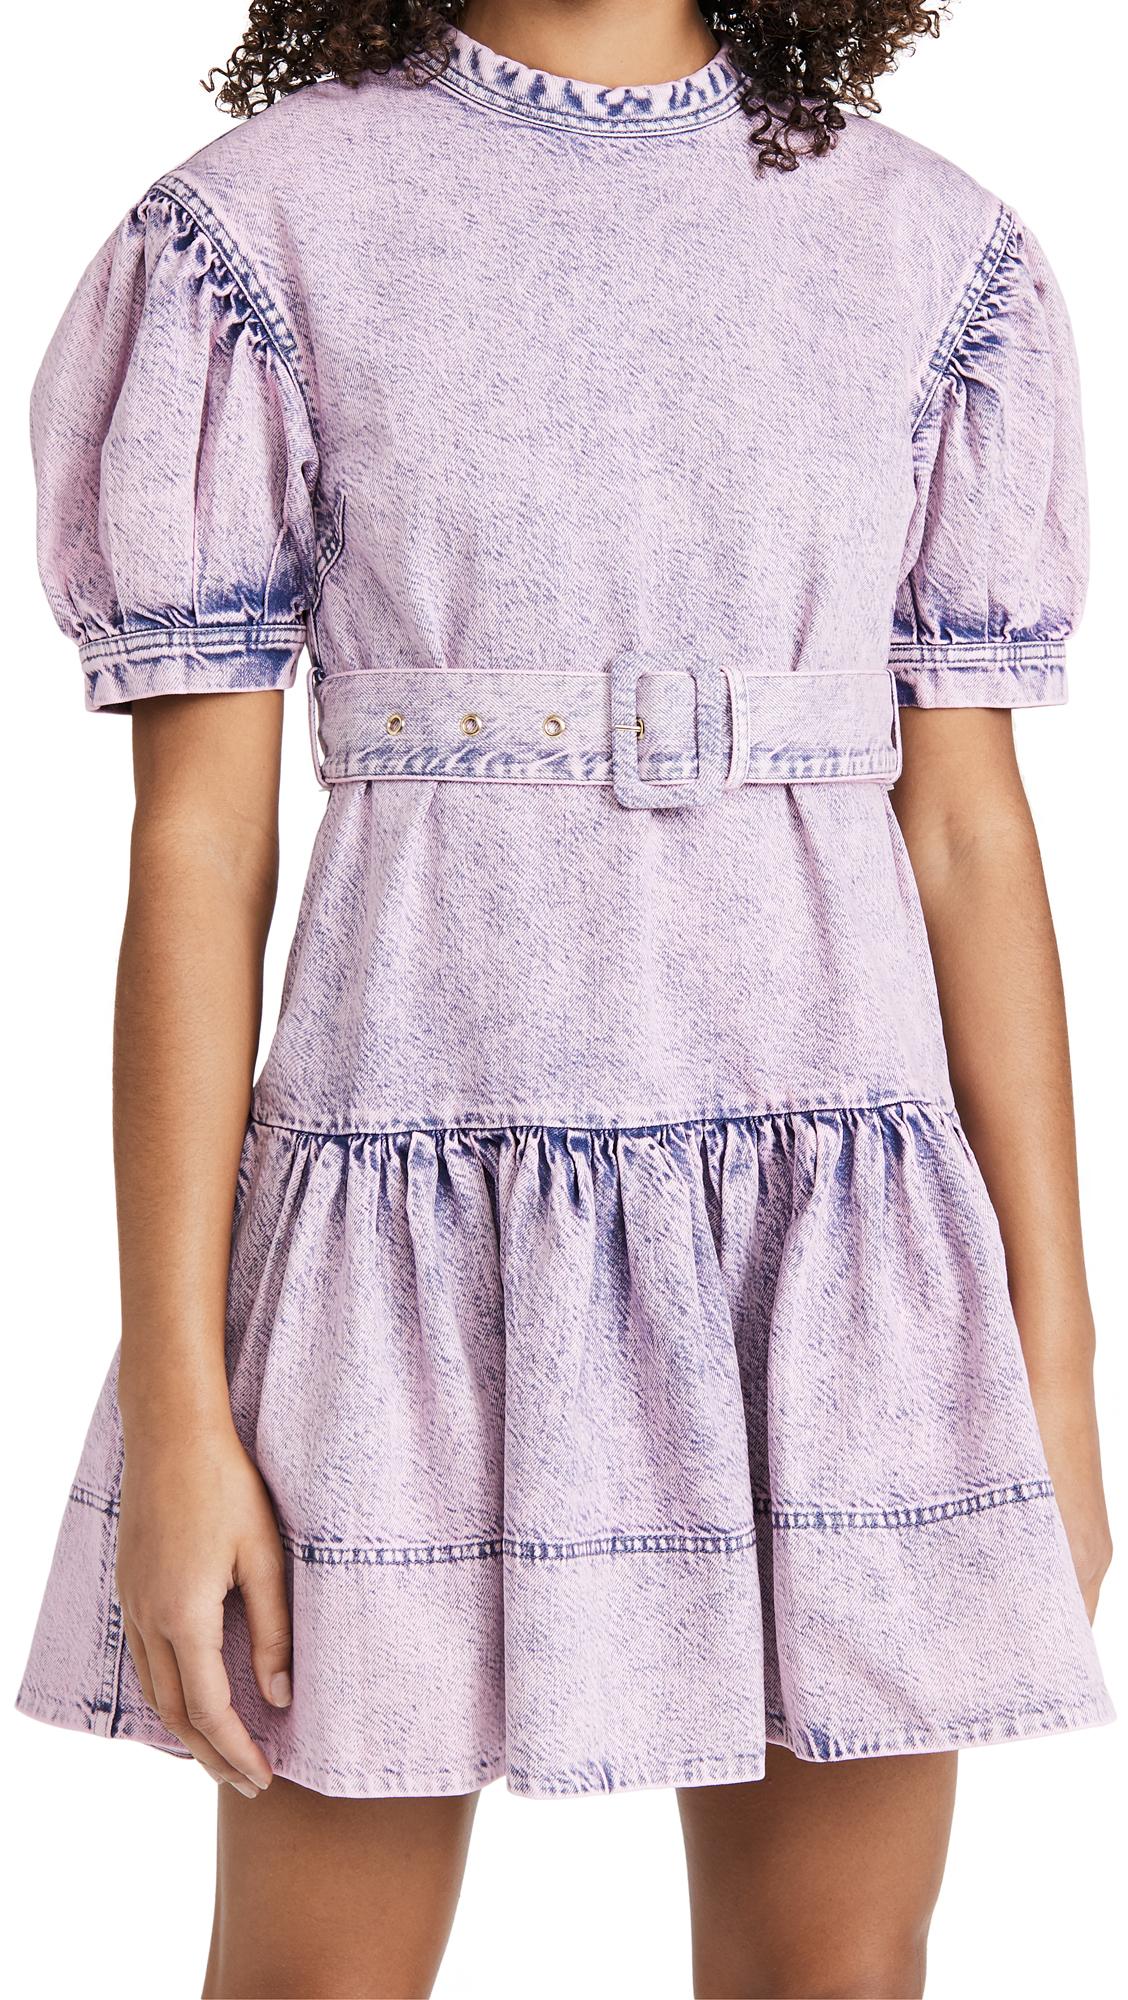 Tanya Taylor Alissa Mini Denim Dress In Pale Blue/pale Pink Overdye